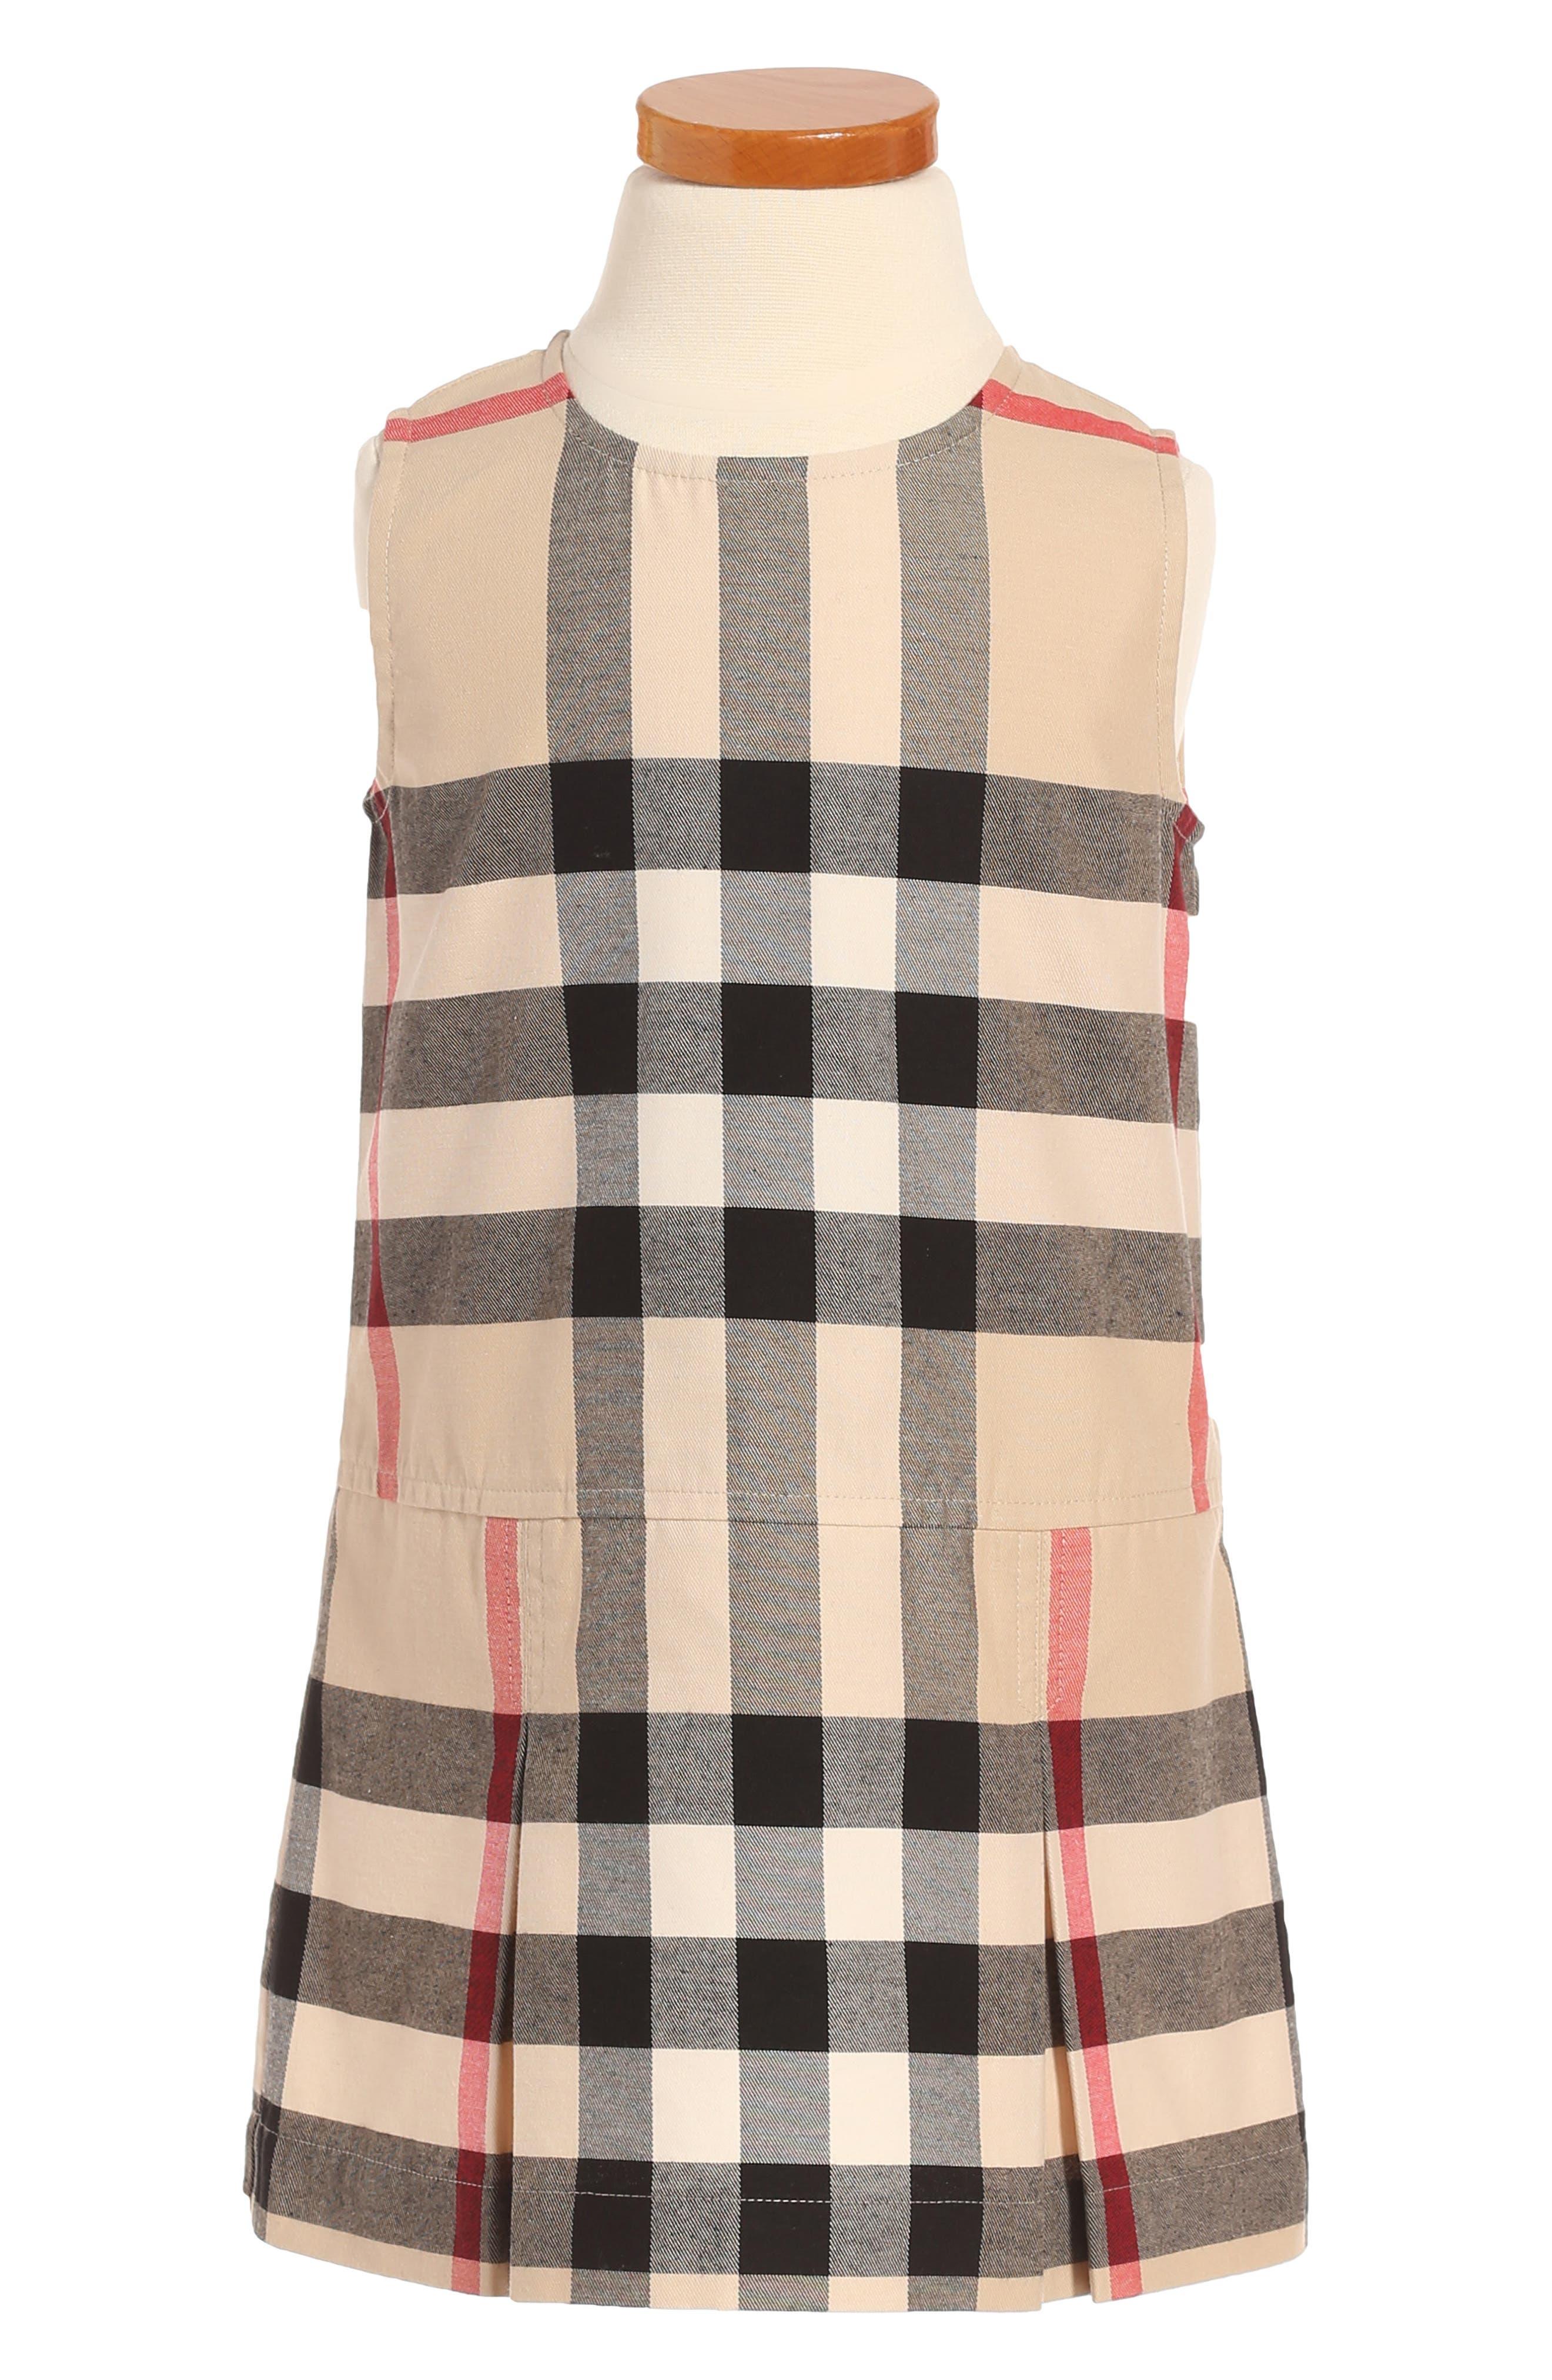 Main Image - Burberry Dawny Check Print Sleeveless Dress (Toddler Girls)